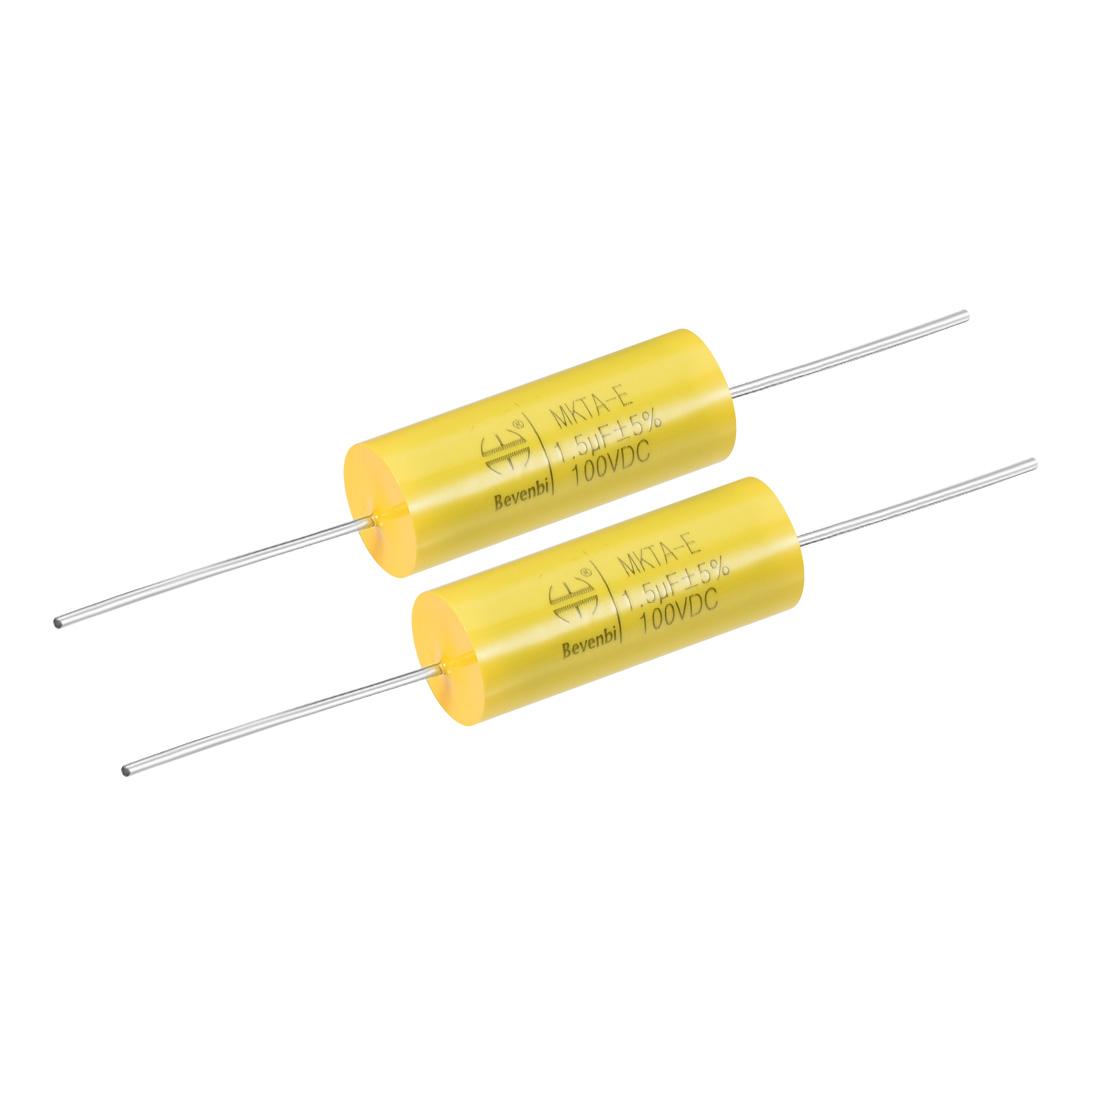 Film Capacitor 100V DC 1.5uF MKTA-E Round Polypropylene Capacitors Yellow 2pcs